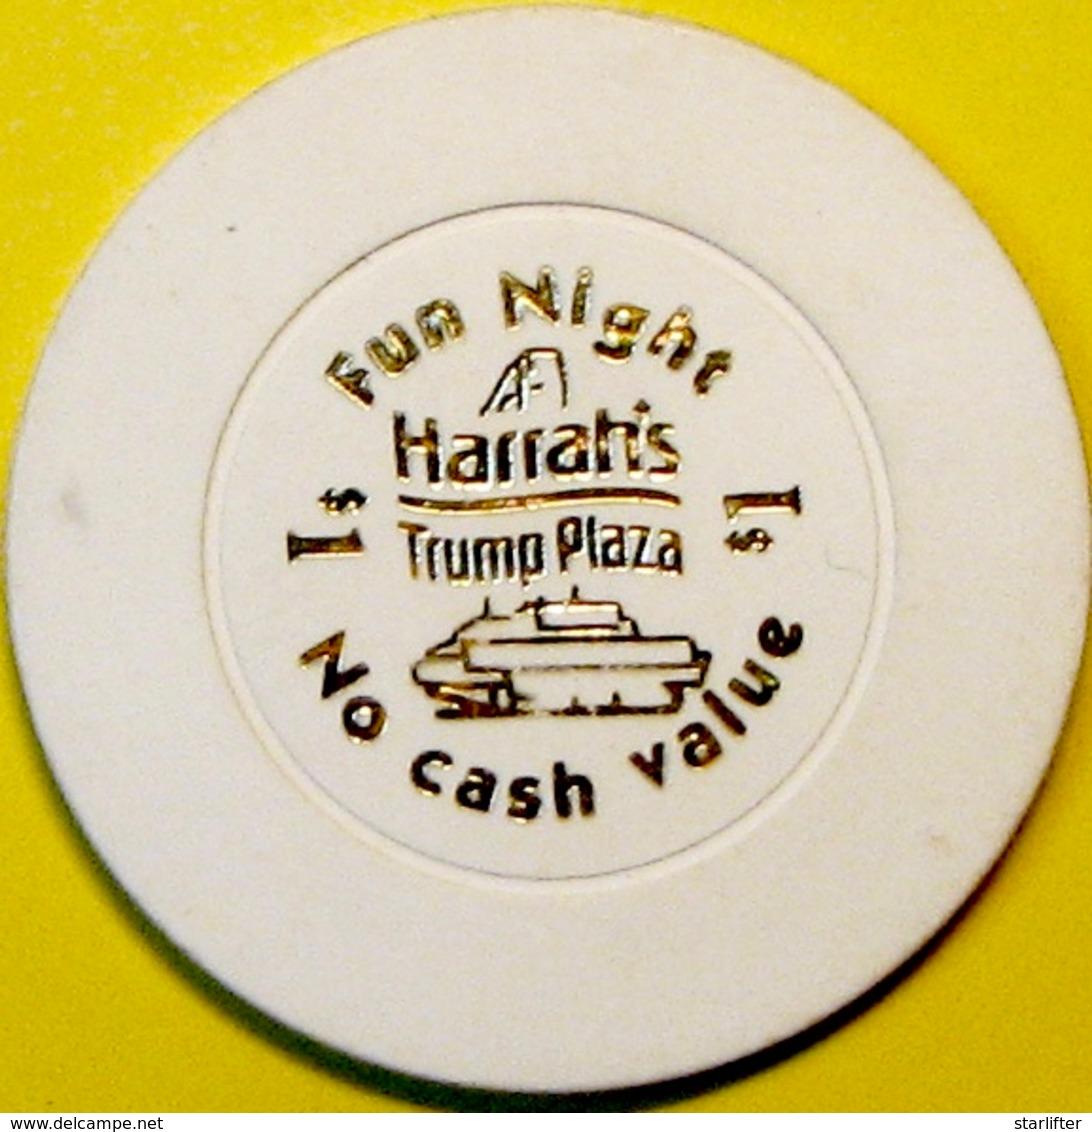 $1 Casino Chip. Harrahs Trump Plaza, Atlantic City, NJ. Fun Night. E78. - Casino